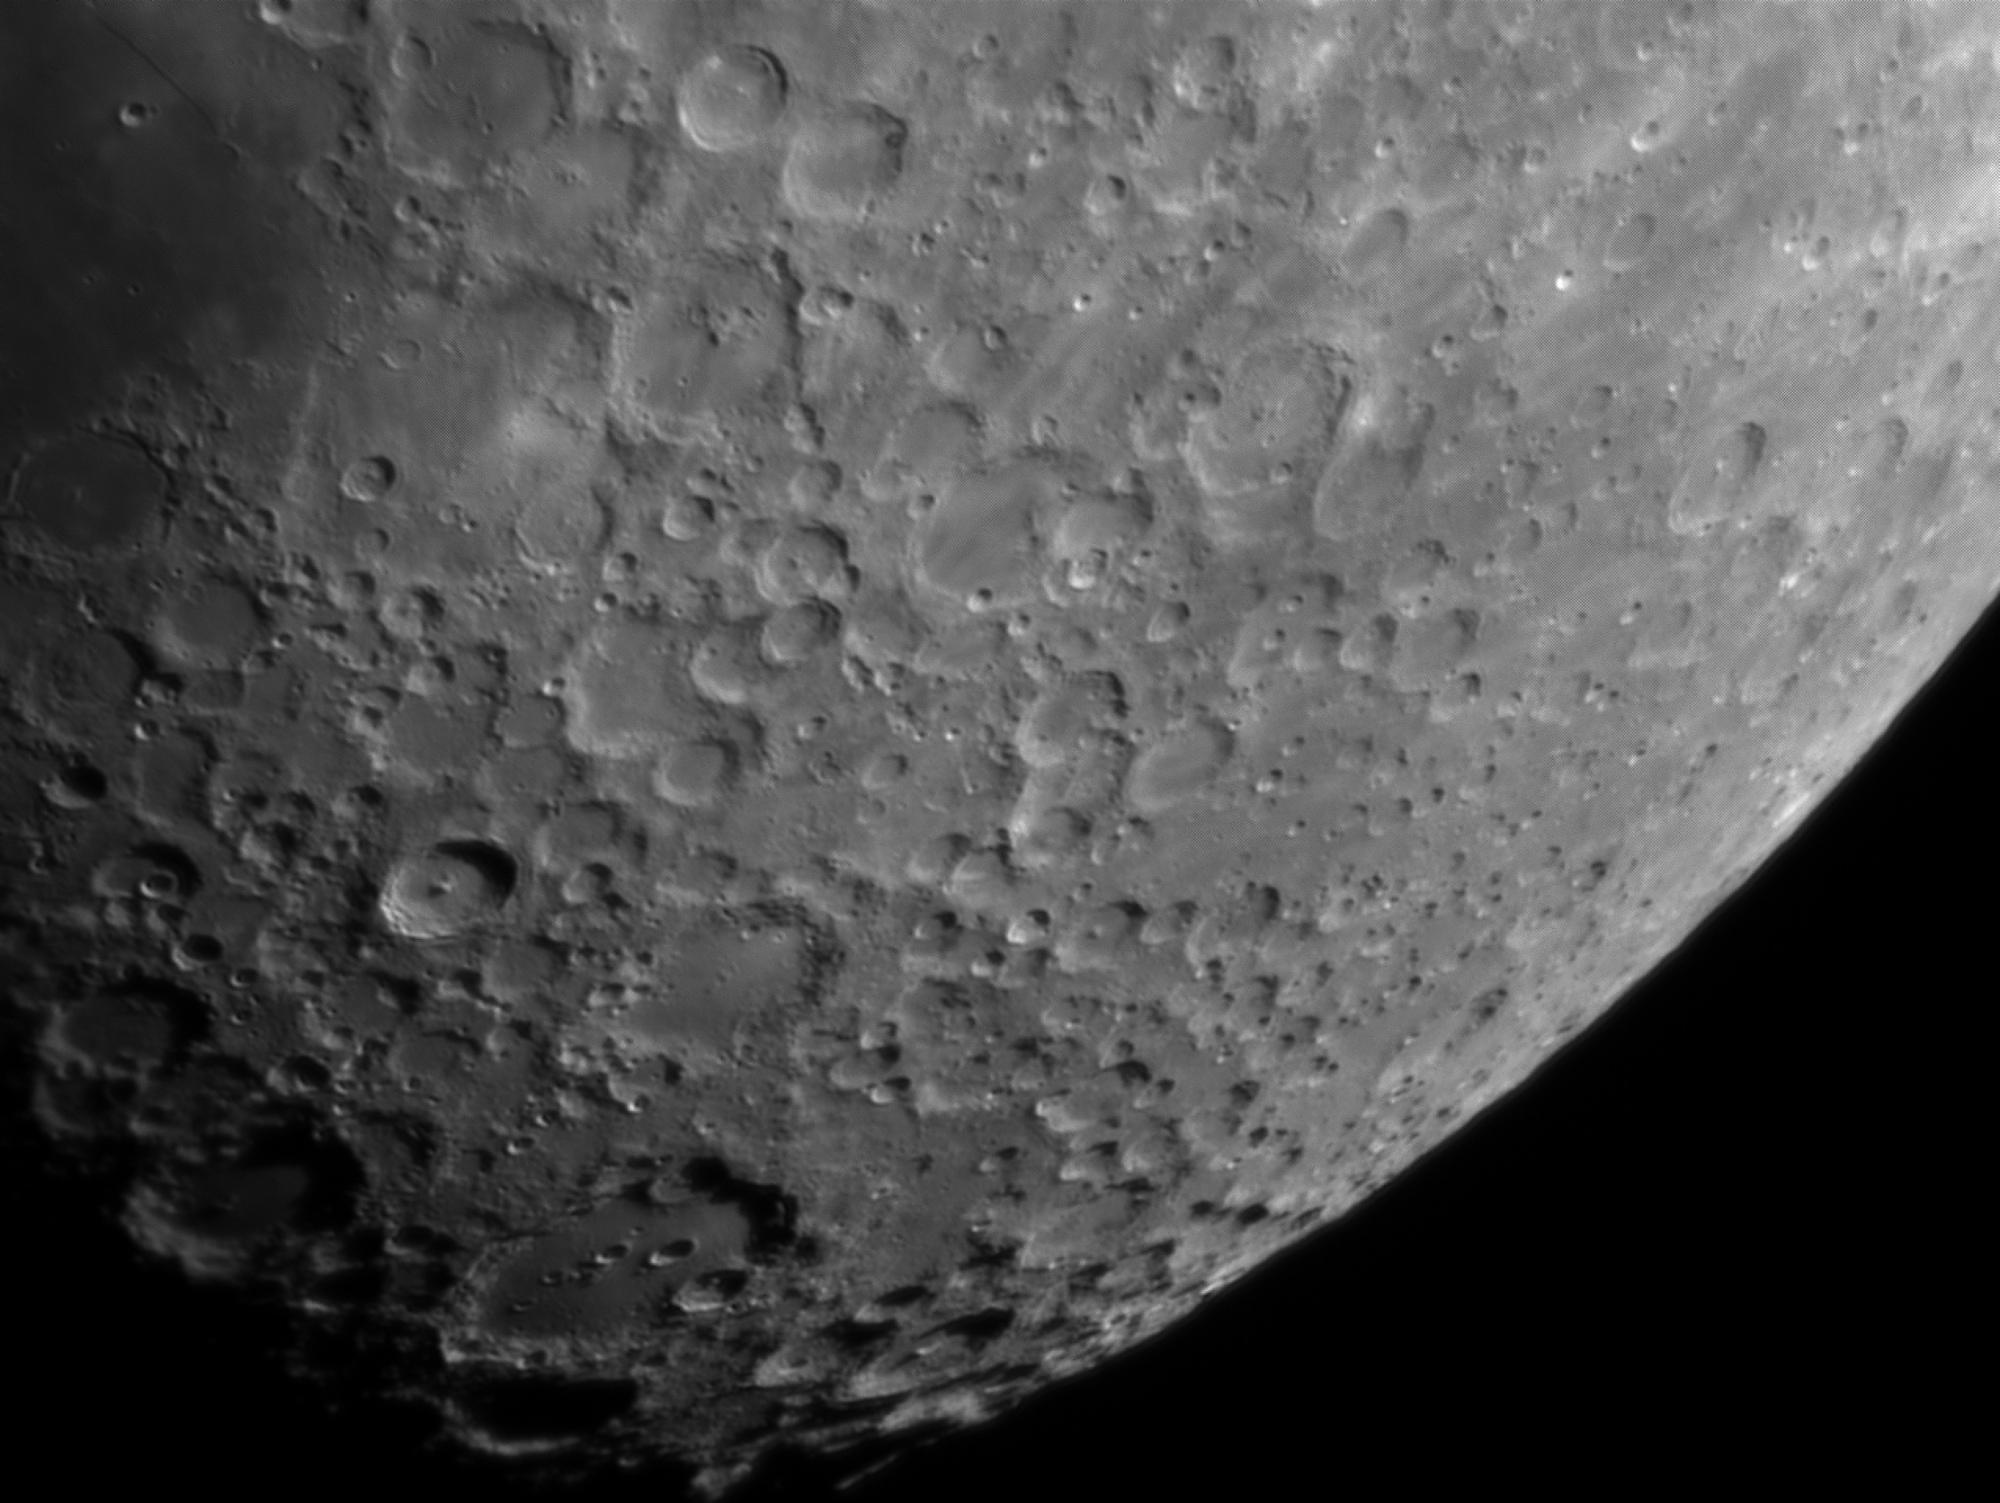 Moon_202016_lapl4_ap1109_R6_DxO2.jpg